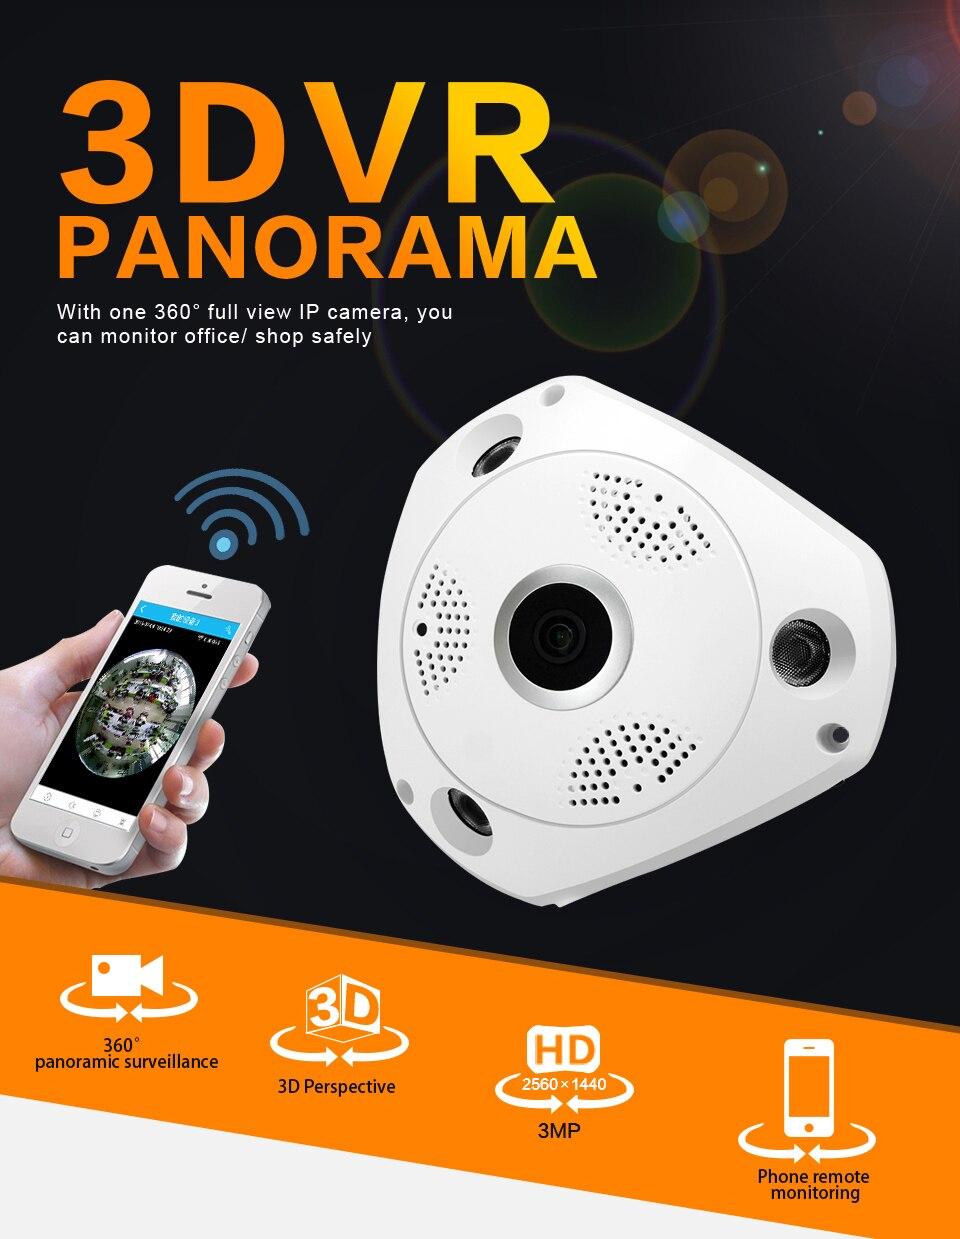 1.3MP Panoramic IP VR Camera WiFi Network Fisheye 1.44mm 360 Wi-Fi Cameras 960P Wireless Surveillance CCTV Cam support VR BOX 1 3mp ip vr camera wifi network fisheye camera 1 44mm 360 panoramic wi fi cameras 960p surveillance cctv cam support vr box